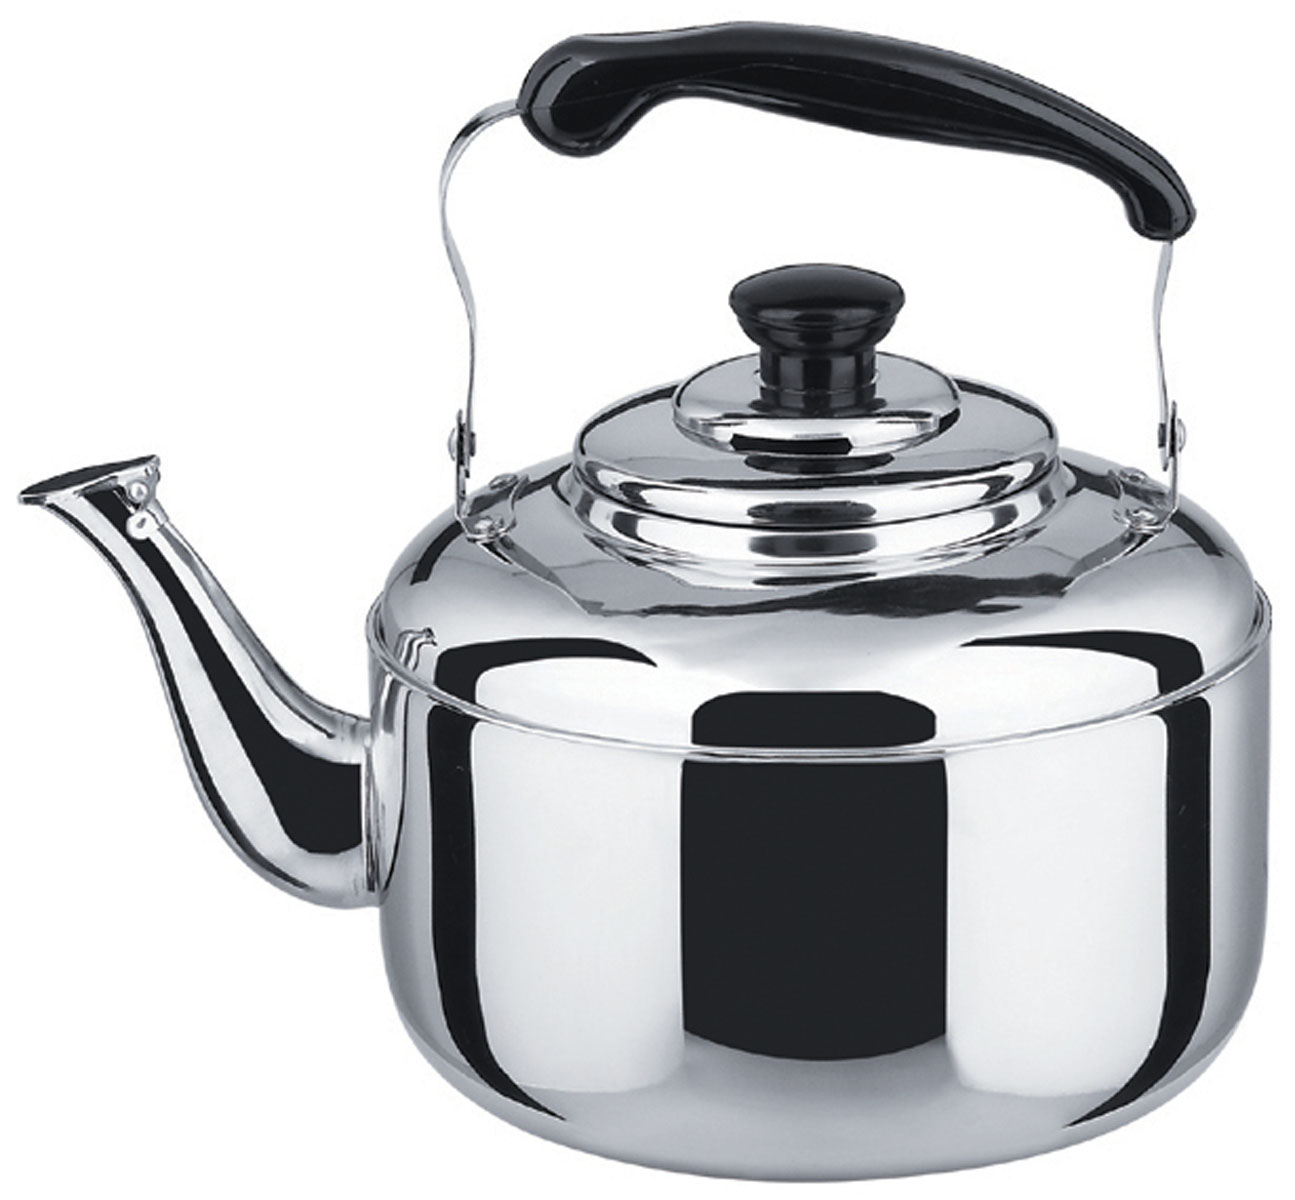 Чайник Bekker Koch со свистком, 2 л. BK-S485 термос bekker koch с помпой 2 5 л bk 4033